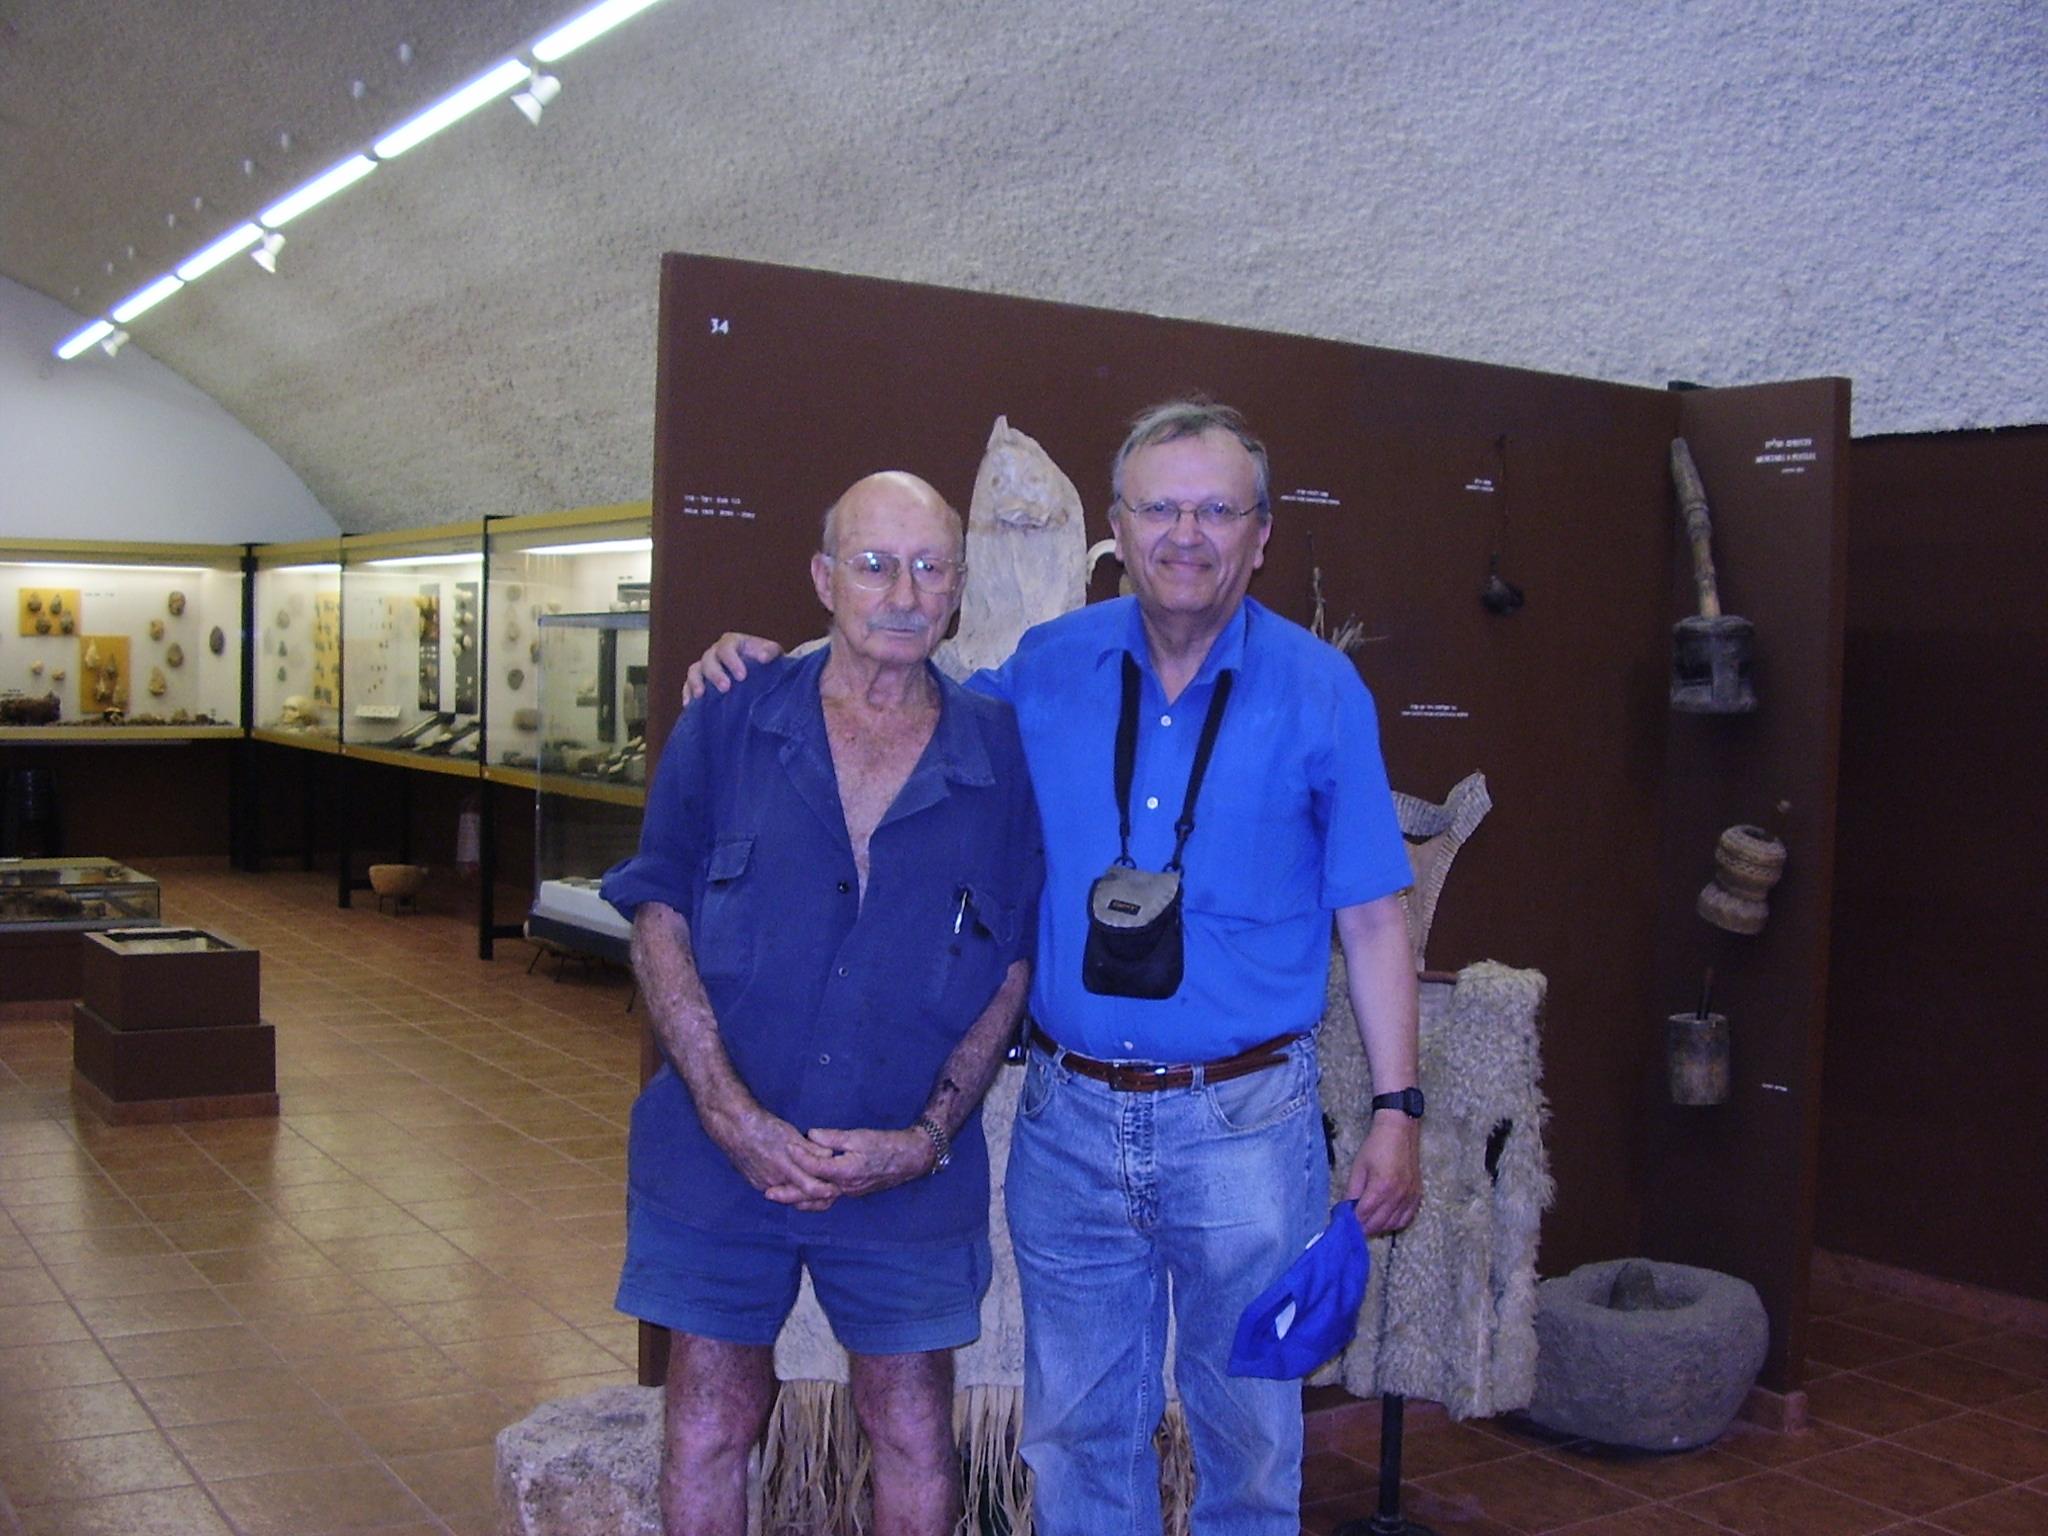 Maayan Baruch Israel  city pictures gallery : :PikiWiki Israel 32243 The Prehistoric man museum in Kibbutz Maayan ...